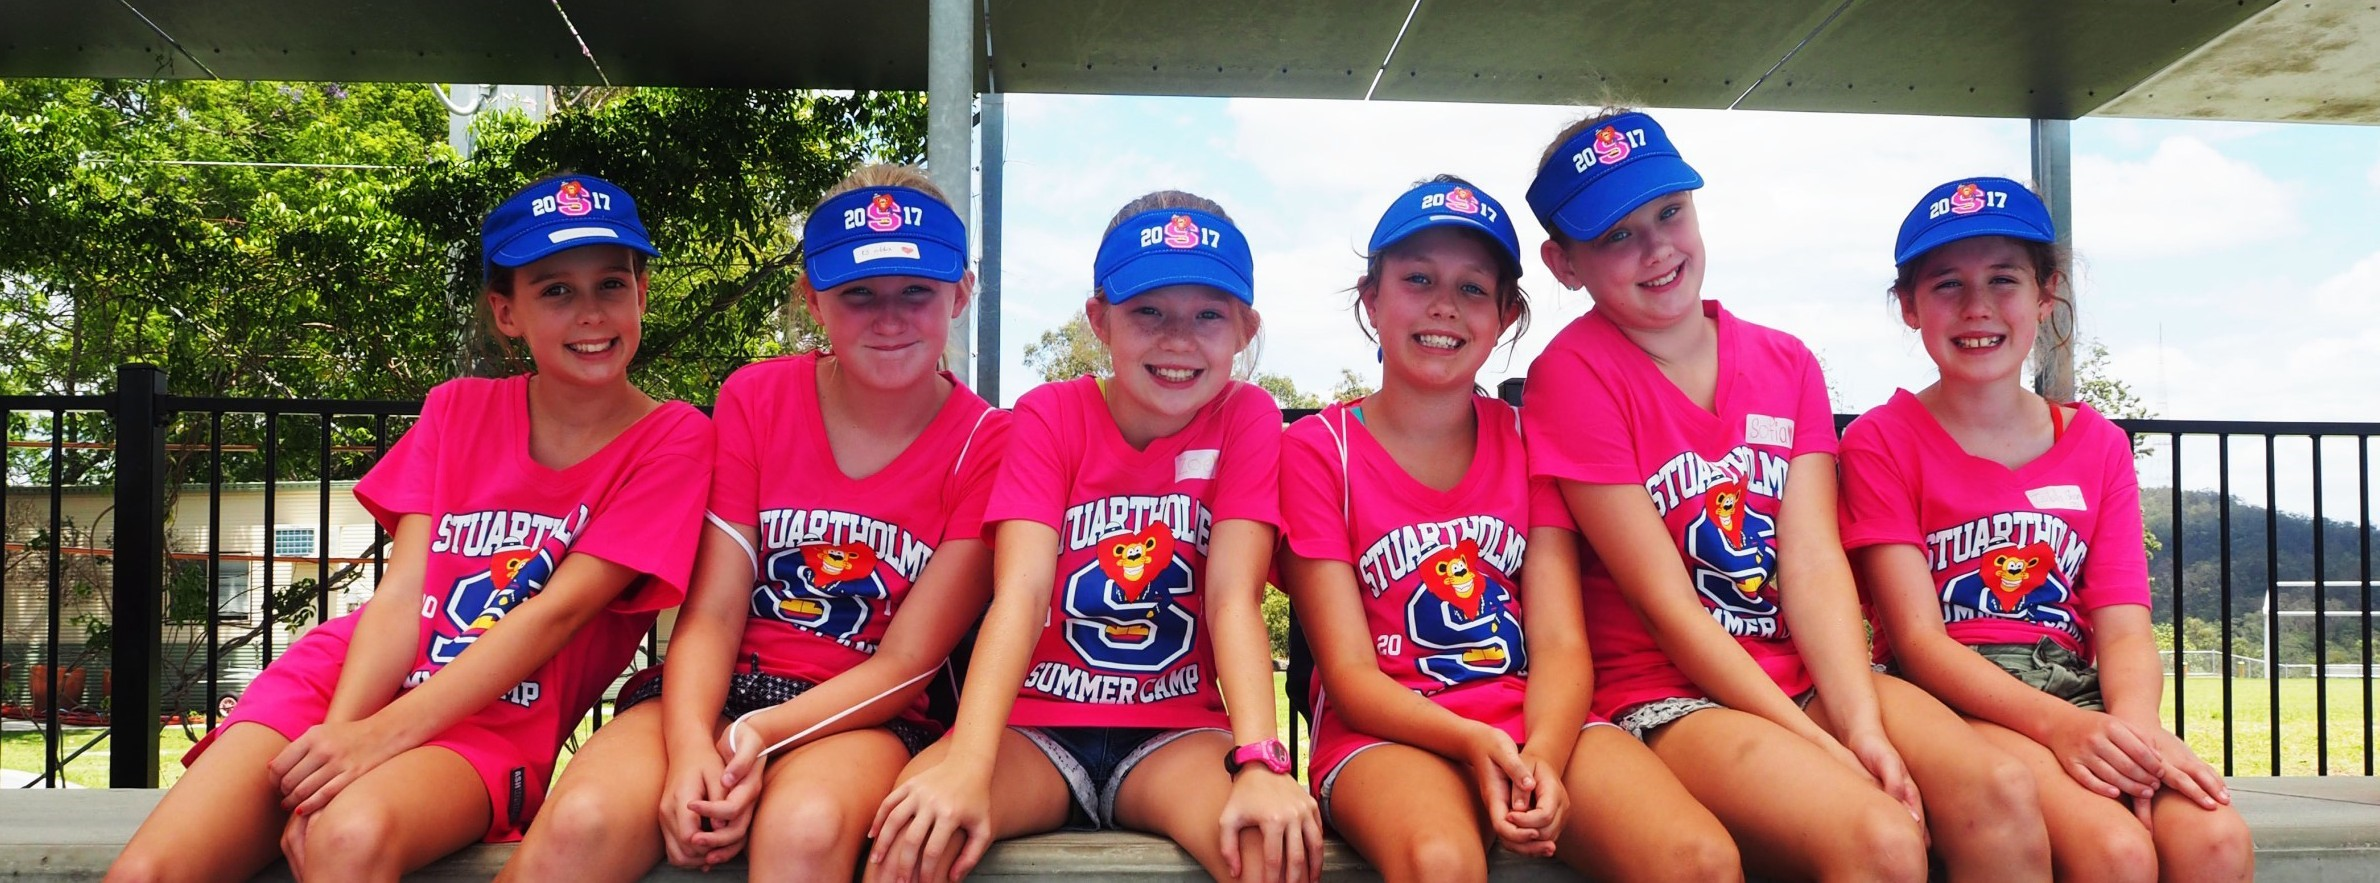 Stuartholme Summer Camp 2020 - Stuartholme School